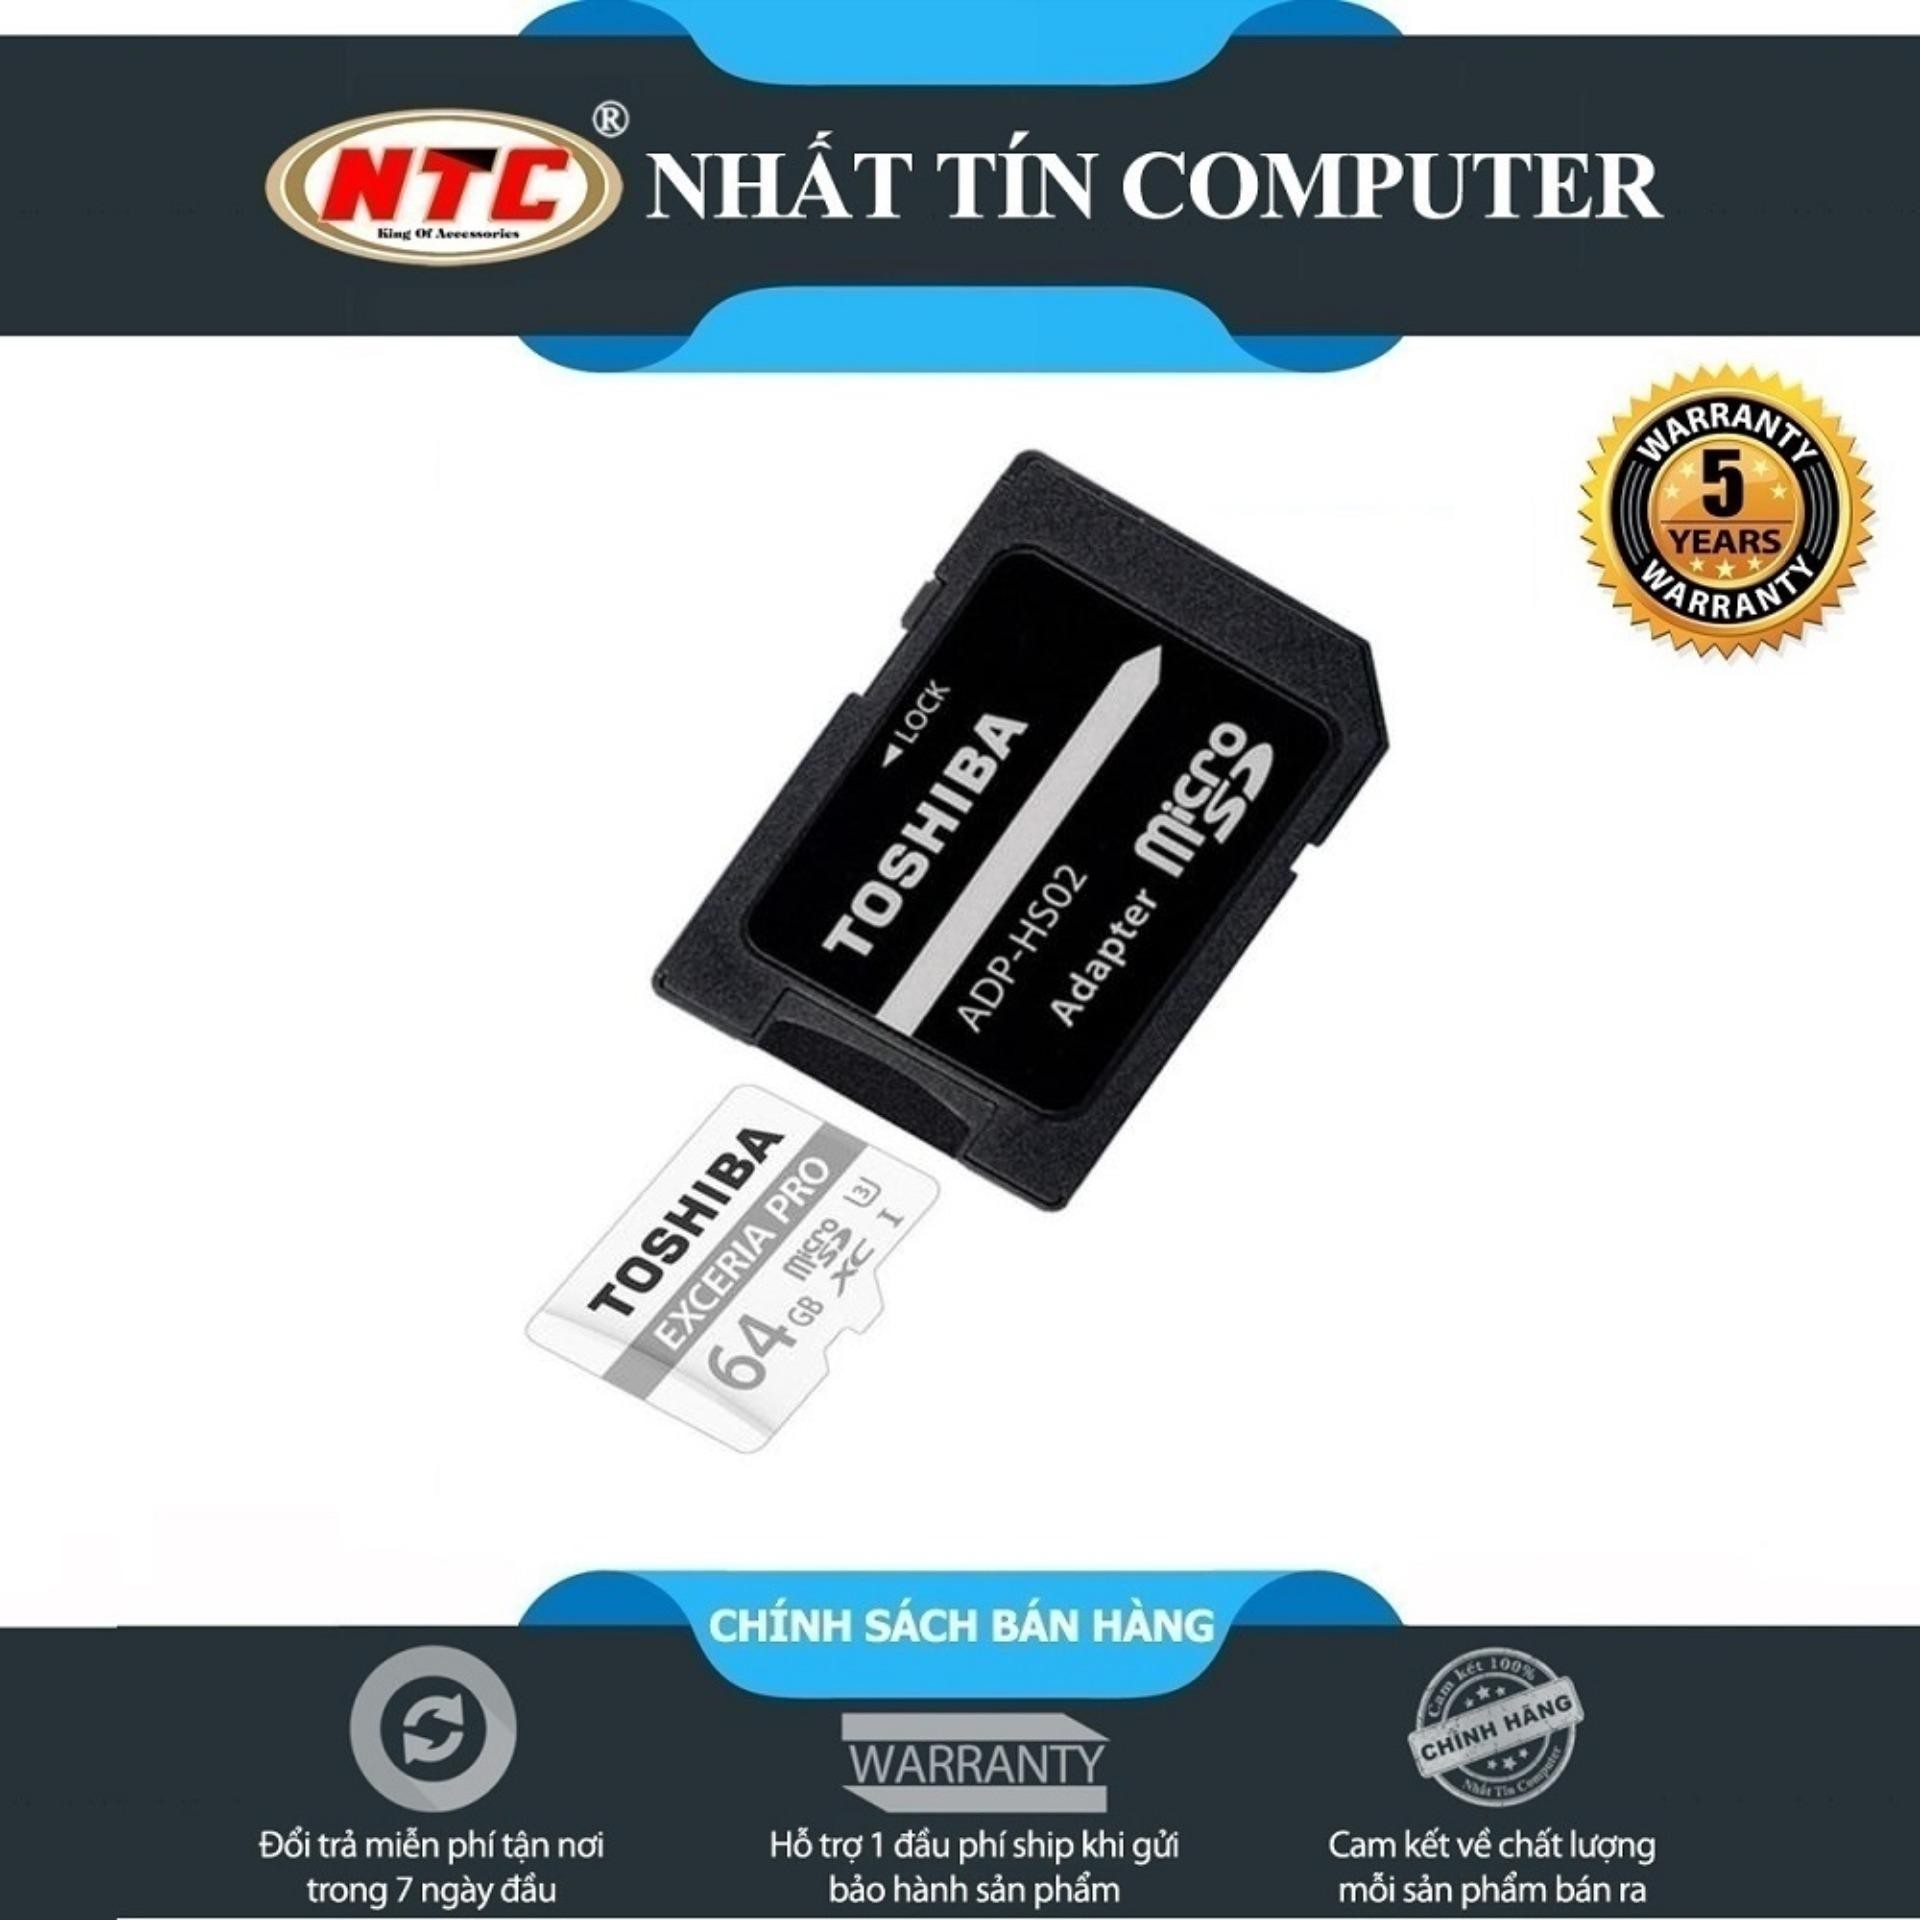 Thẻ nhớ MicroSDXC Toshiba Exceria Pro M401 64GB UHS-I U3 4K 95MB.s [Bạc] - Toshiba Exceria 5